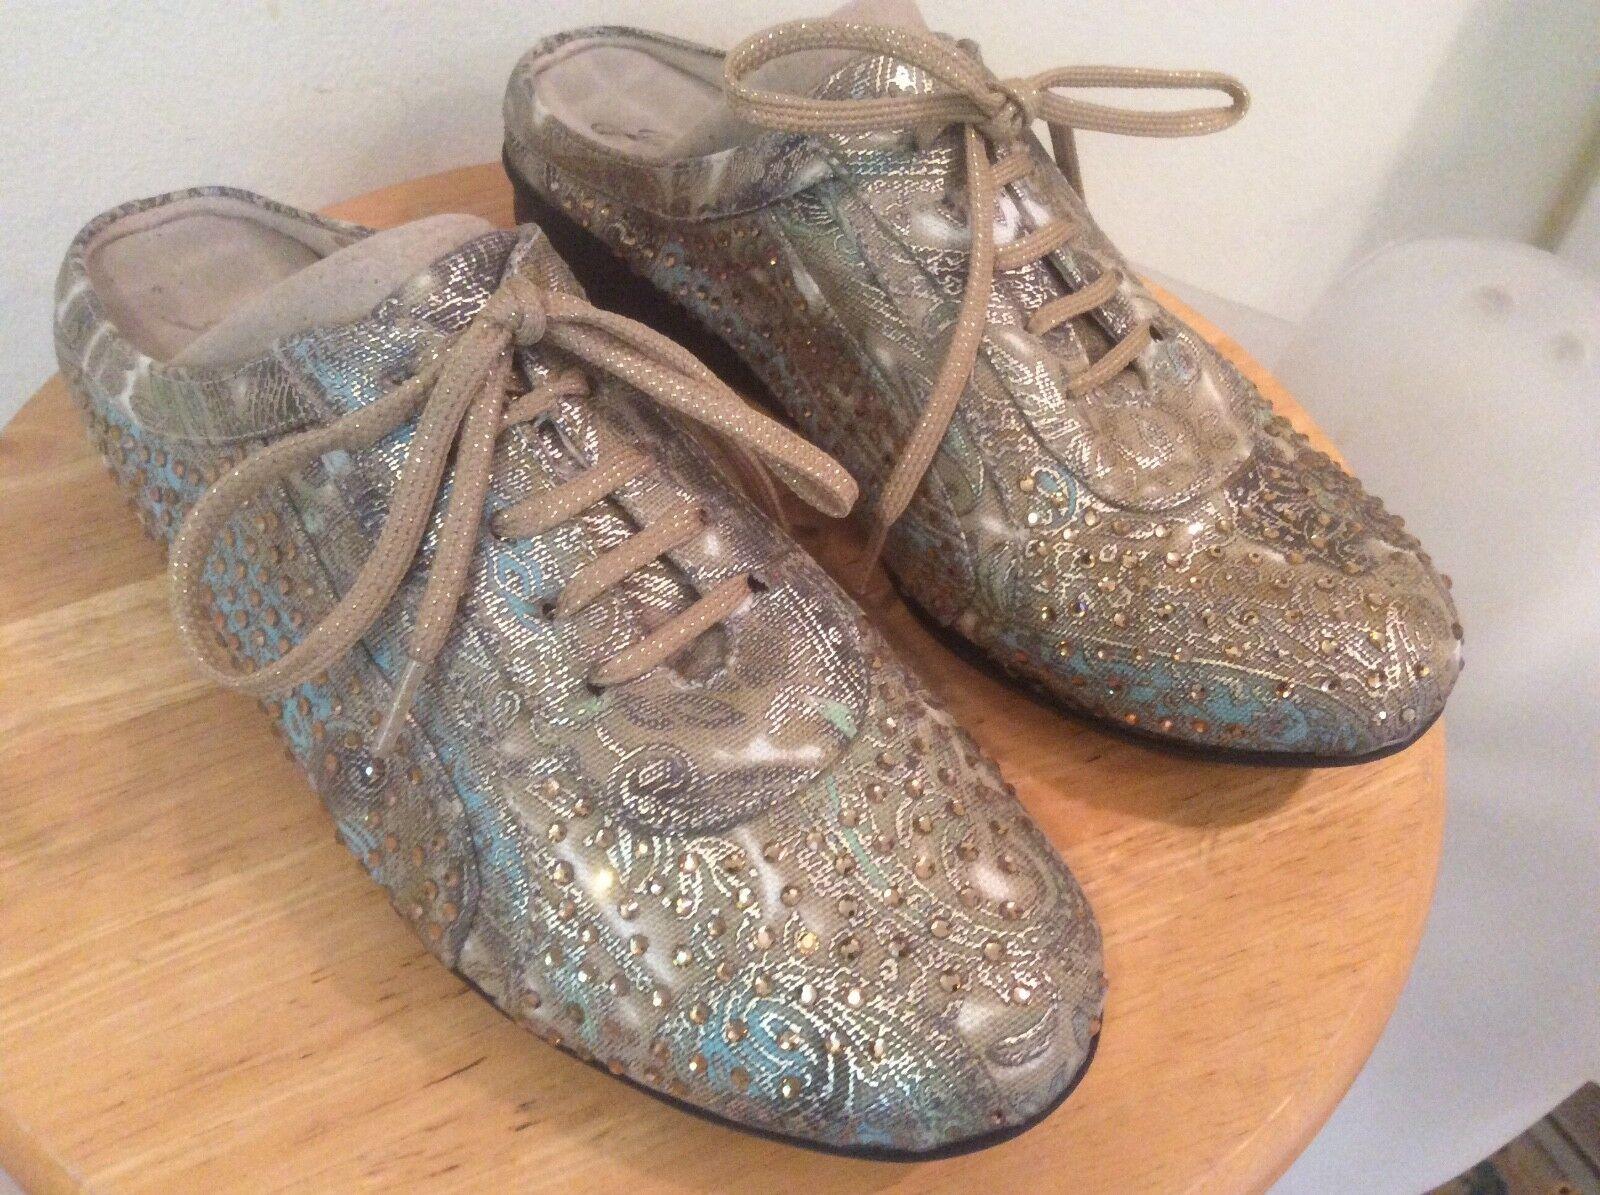 Joan Boyce - Sz Crystal 8 M Art-to-Wear Crystal Sz Paisley Gold Slide Mules Shoes 46246b